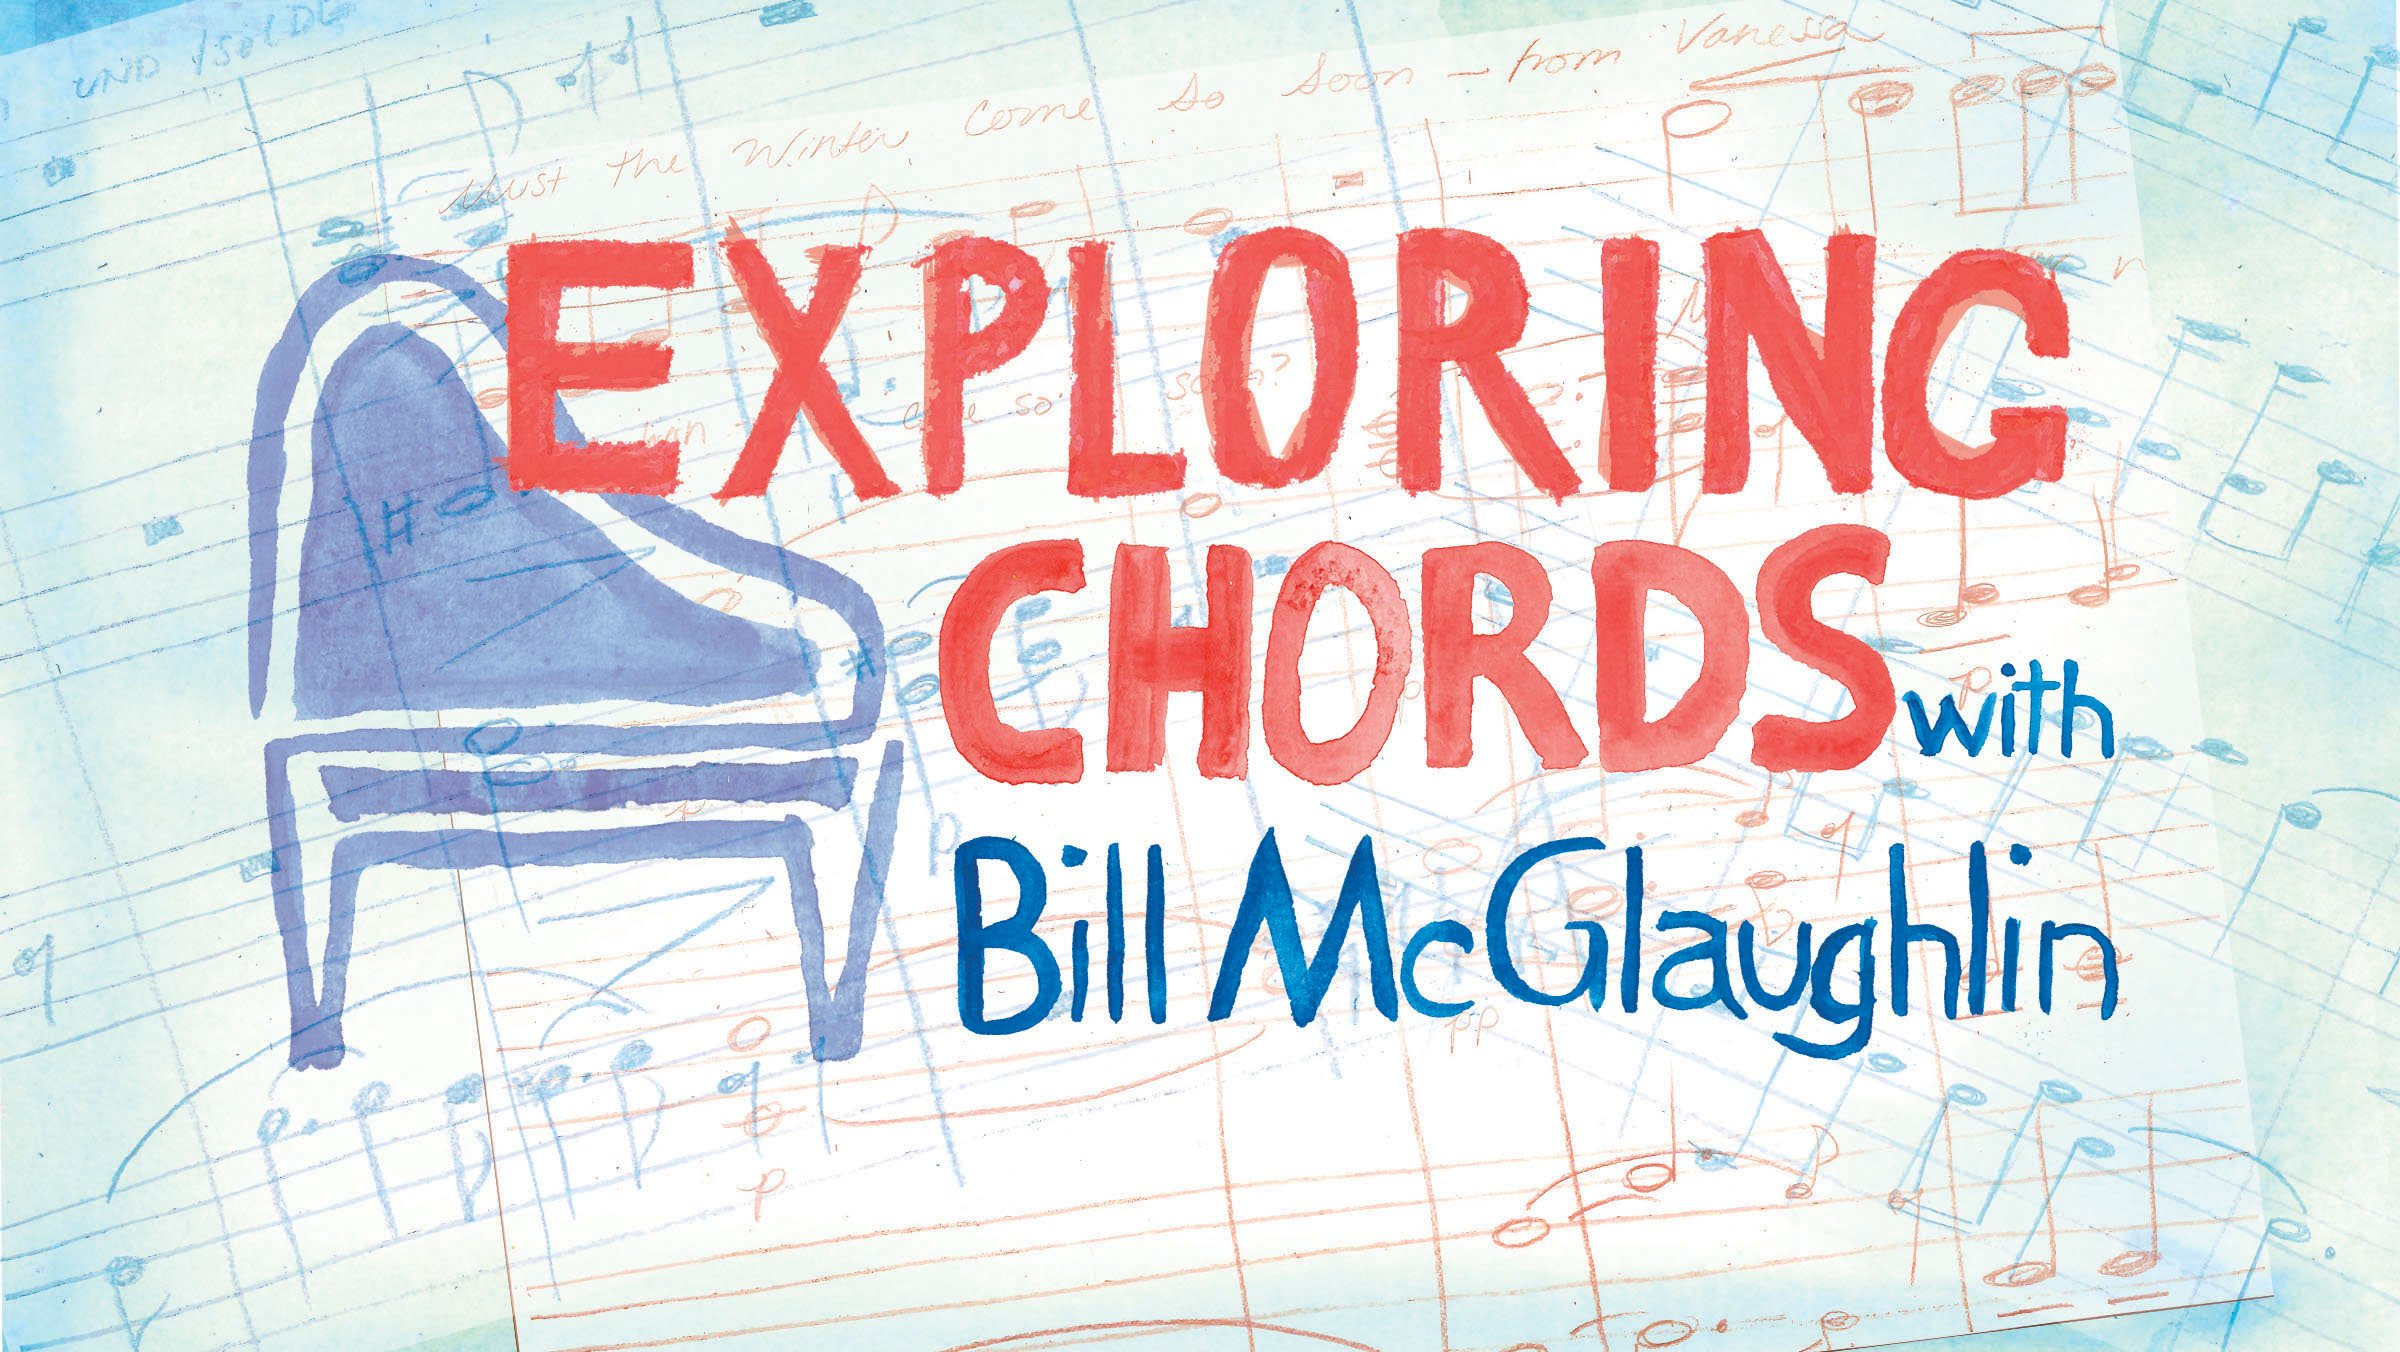 Exploring Chords with Bill McGlaughlin